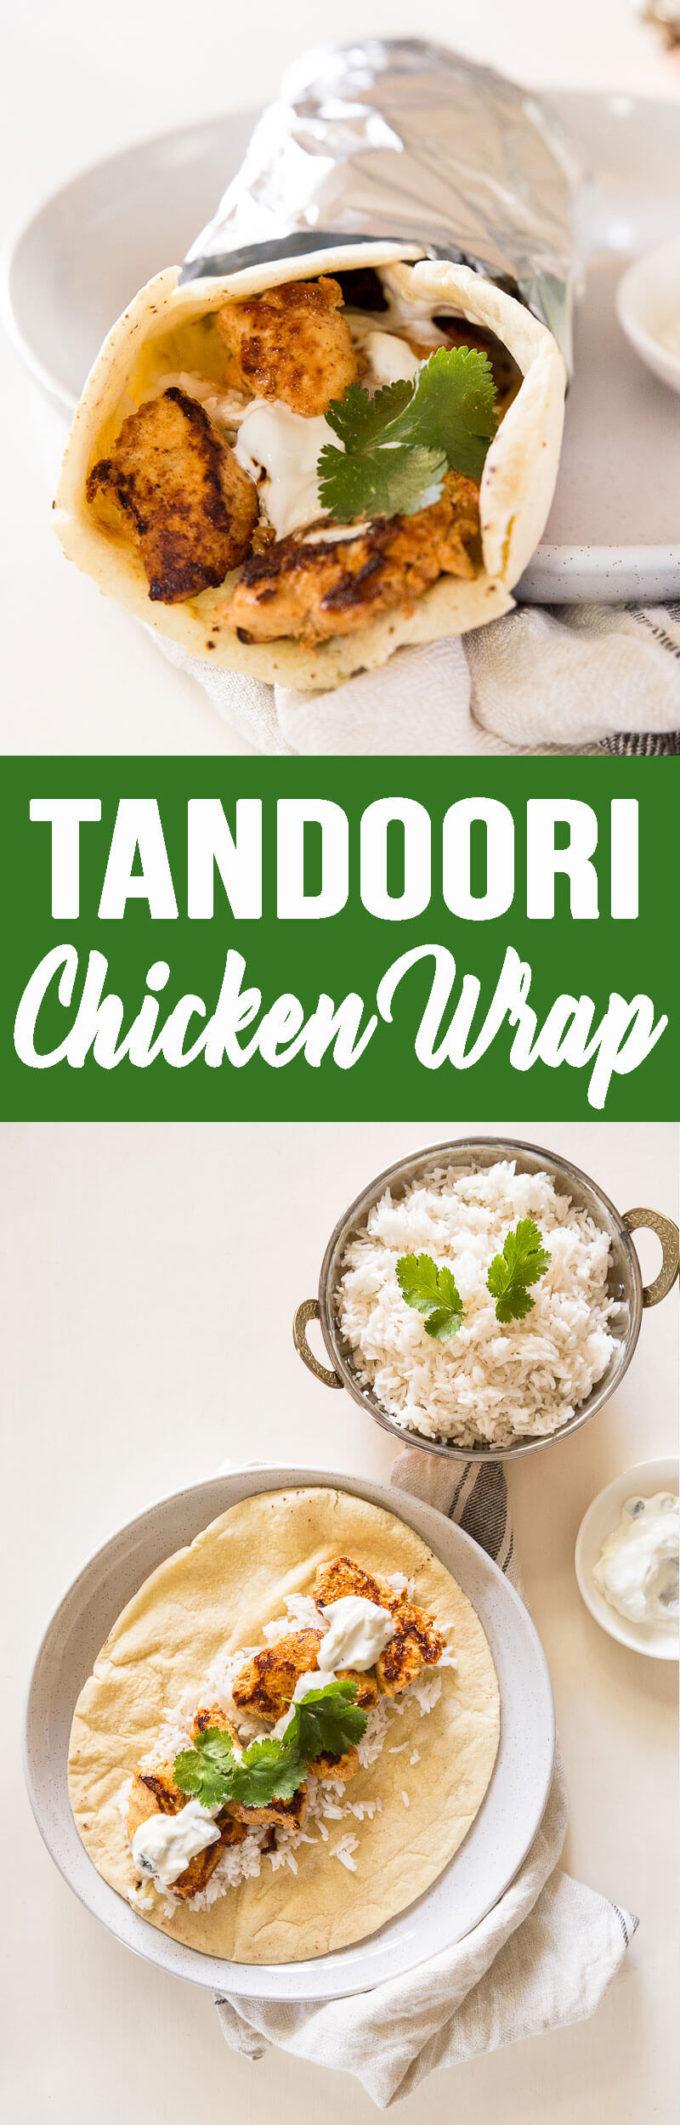 Tandoori Chicken Wraps make for an easy dinner.